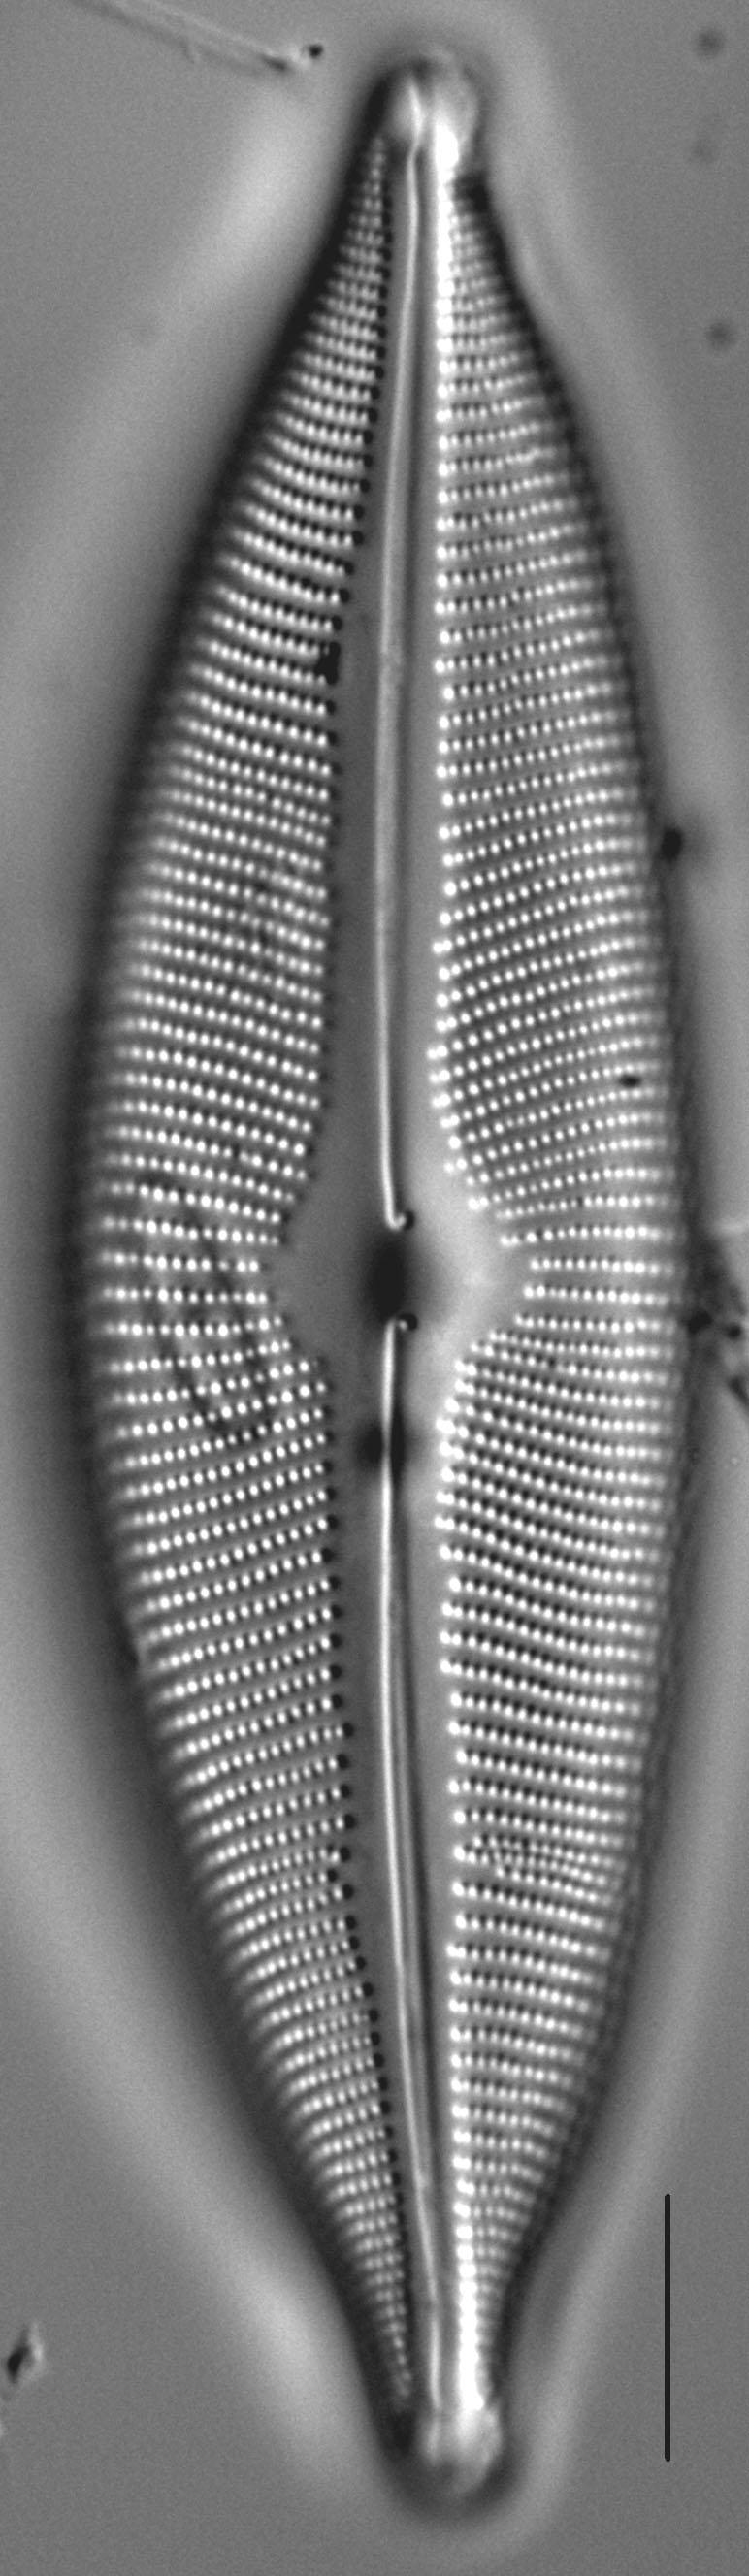 Cymbopleura subcuspidata LM2